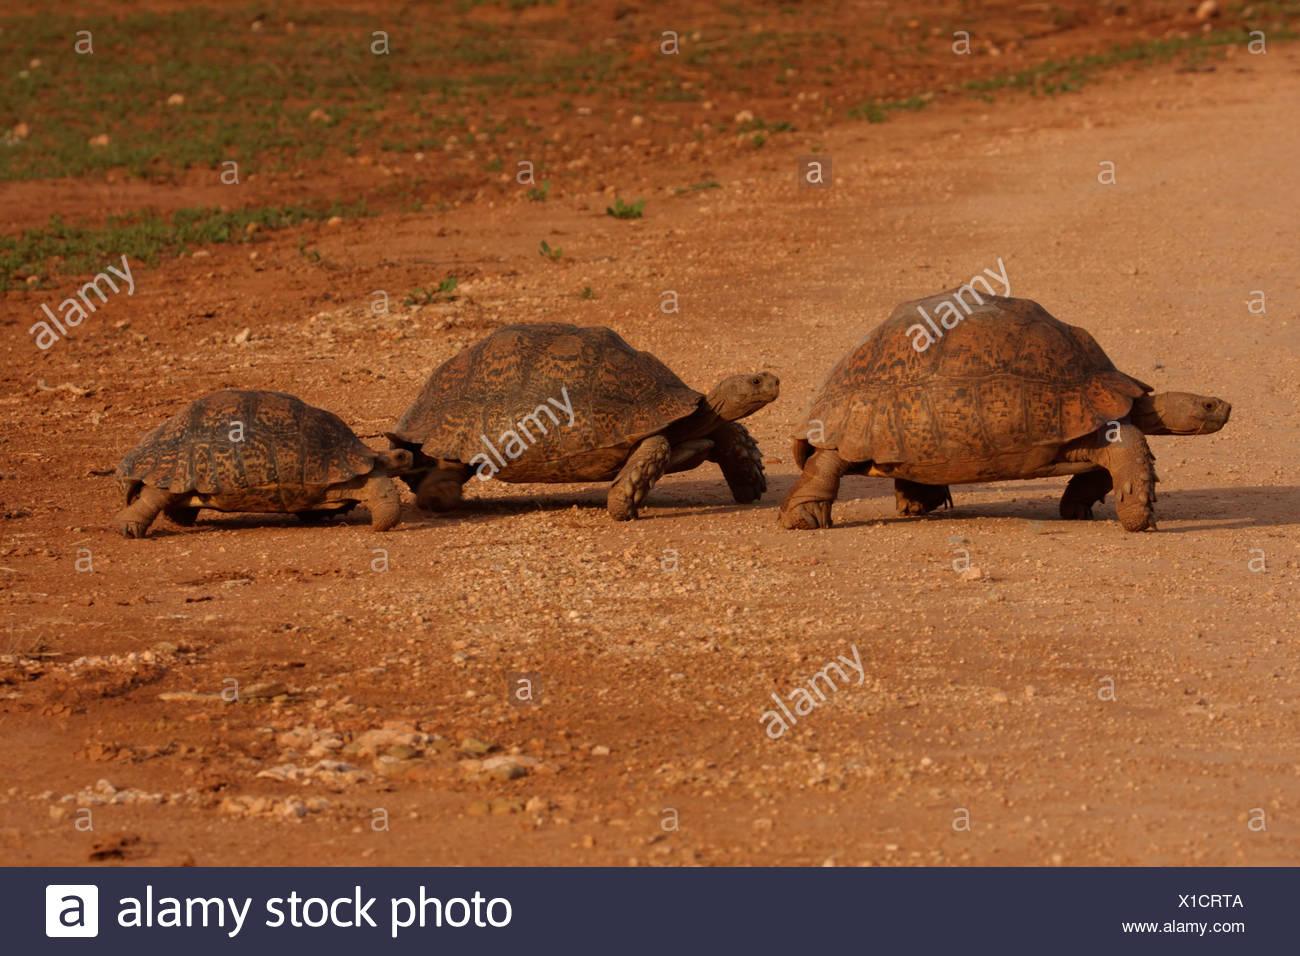 leopard tortoise (Geochelone pardalis), familiy, South Africa, Eastern Cape, Addo Elephant National Park - Stock Image